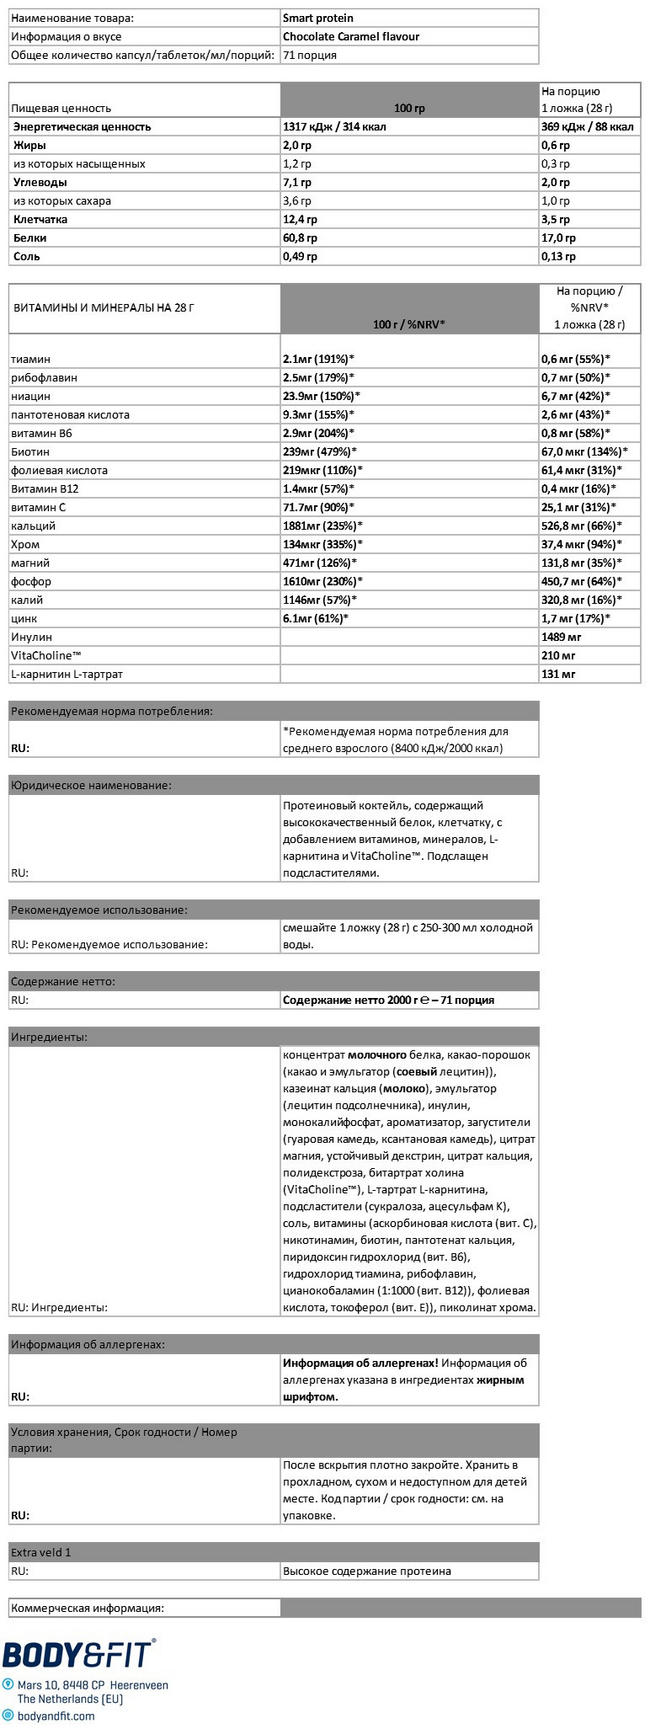 Протеин «Смарт» Nutritional Information 1